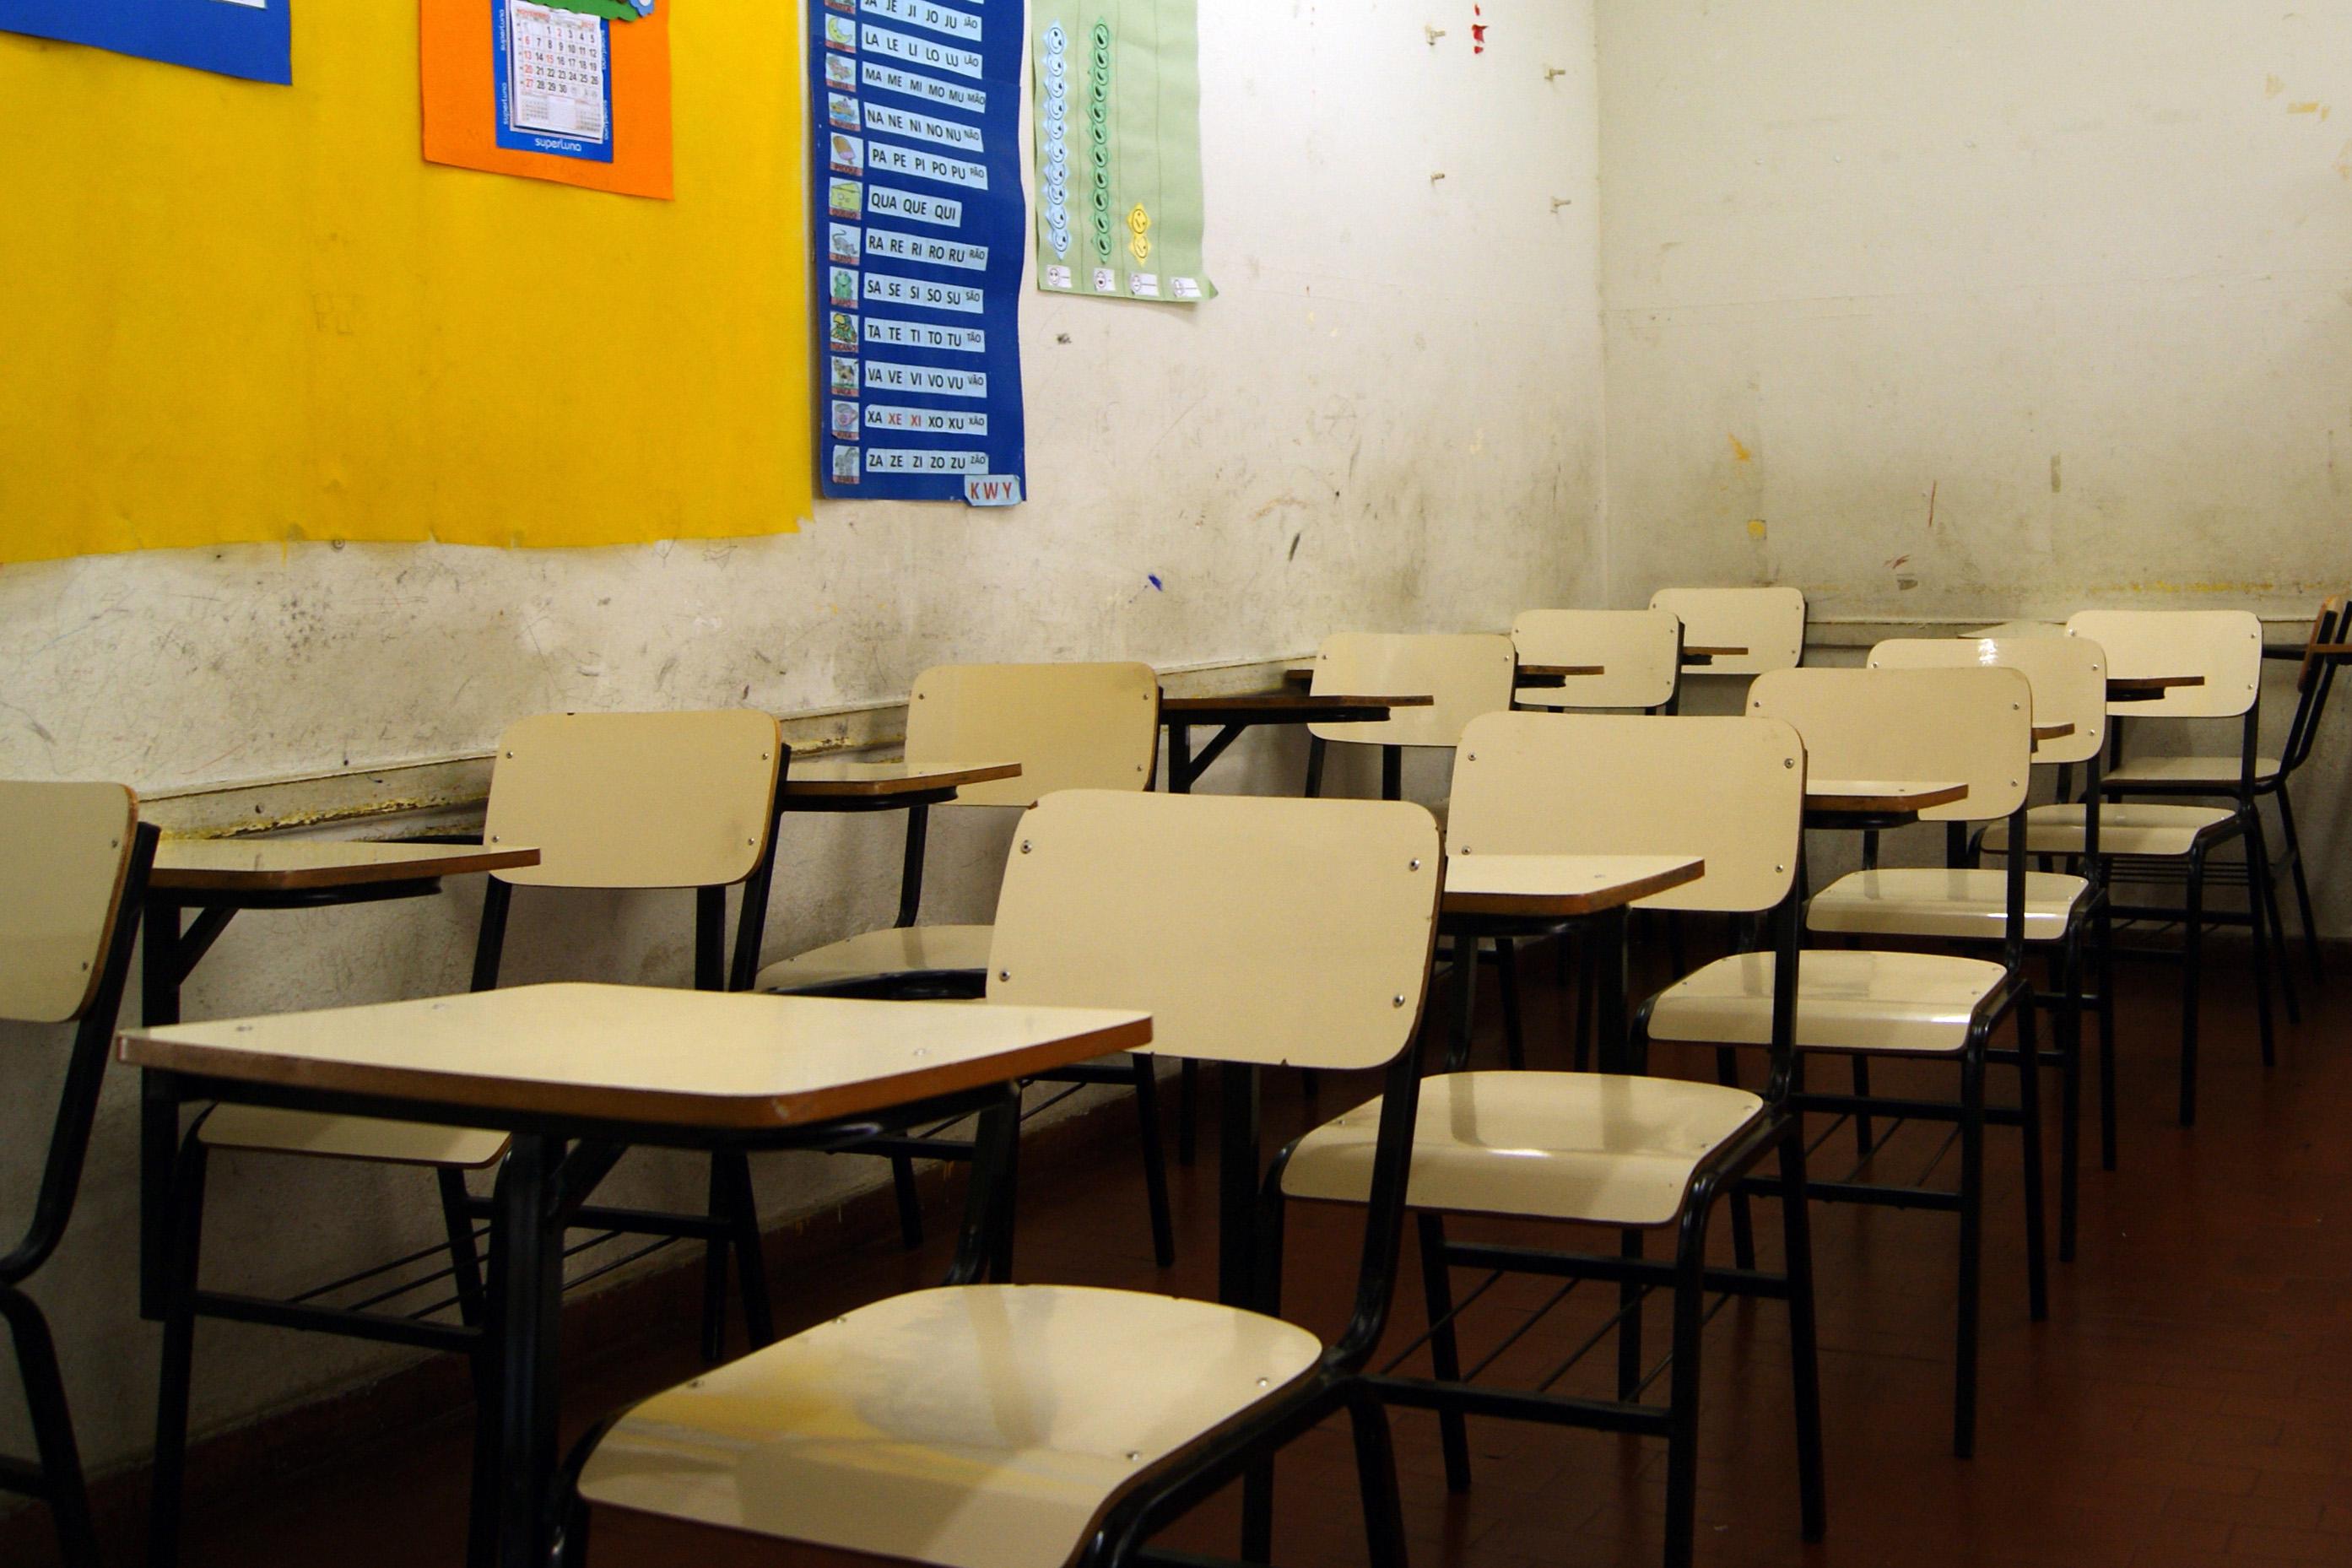 (In)justiça Escolar No Brasil